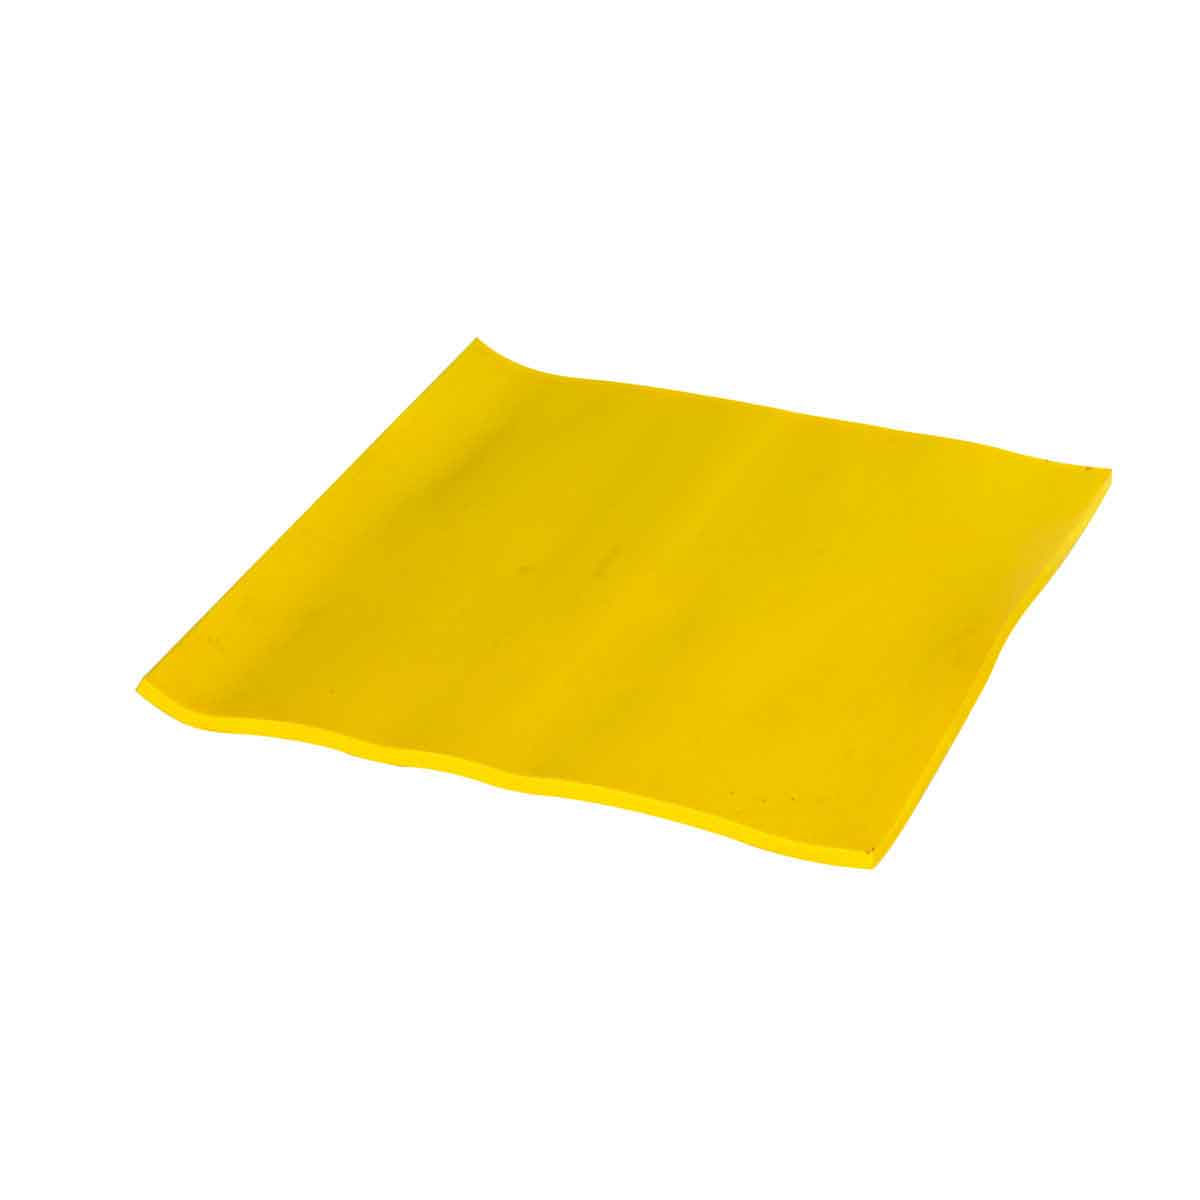 PIG® Rapid Response DrainBlocker® PLR603 Square Drain Cover, Polypropylene/Polyurethane, Hi-Viz Green